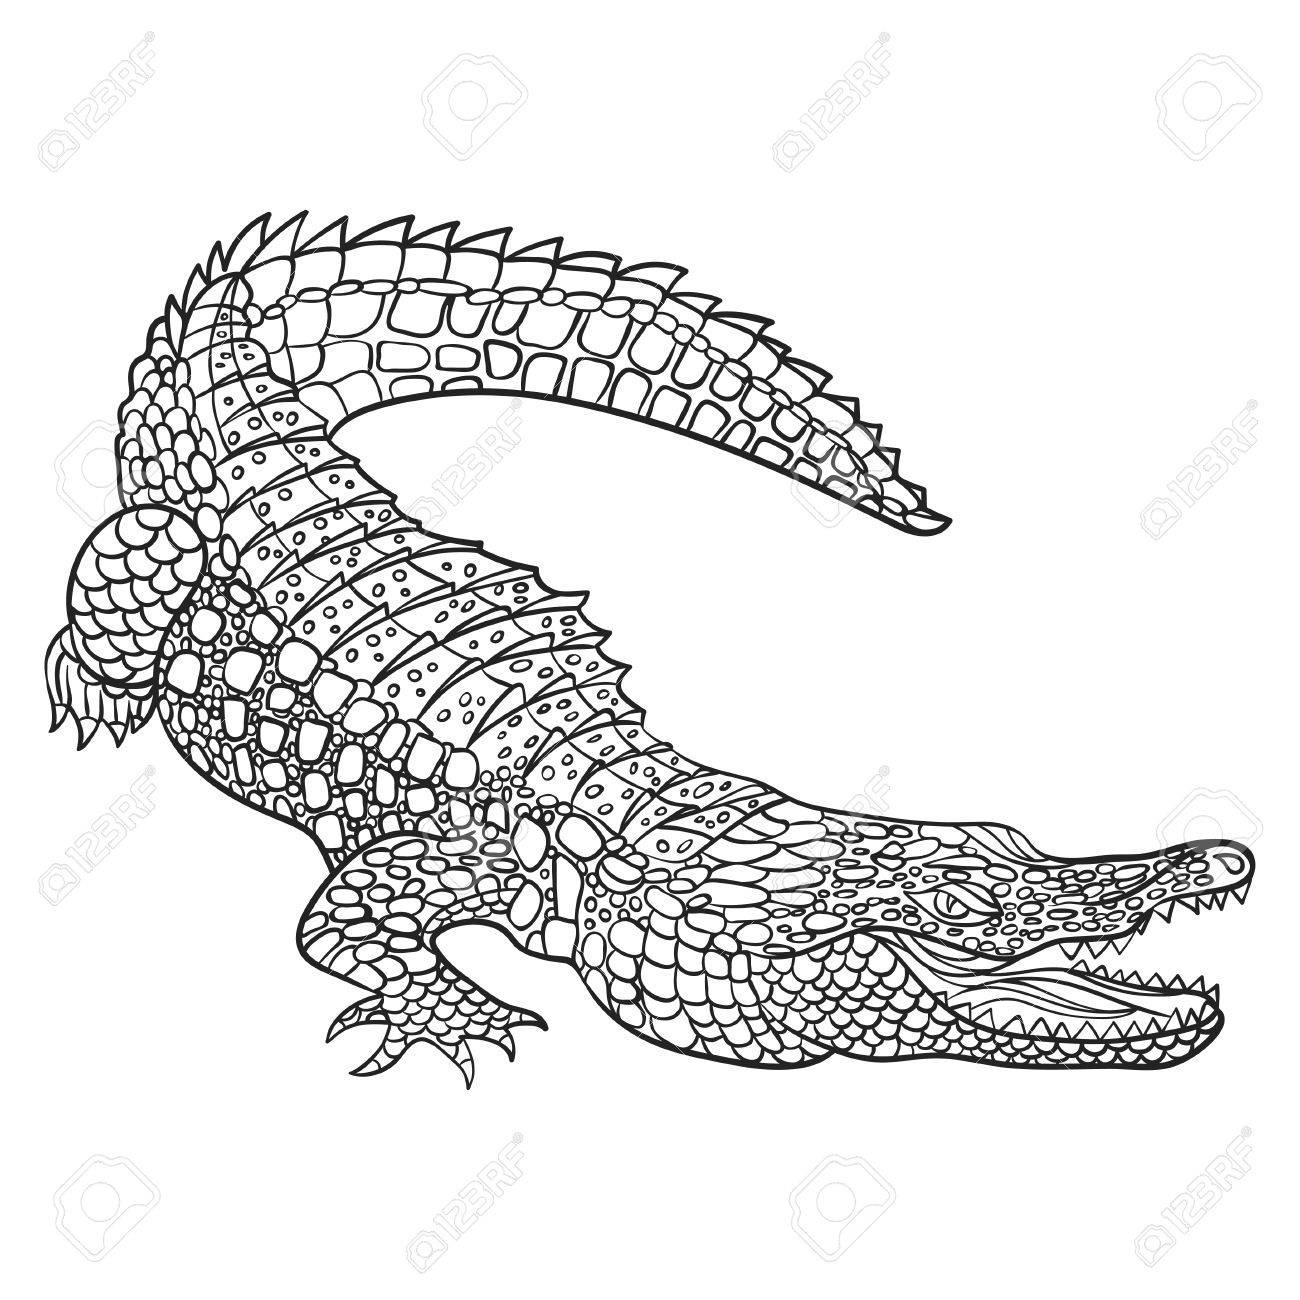 1300x1300 Vector Monochrome Hand Drawn Illustration Of Crocodile. Coloring